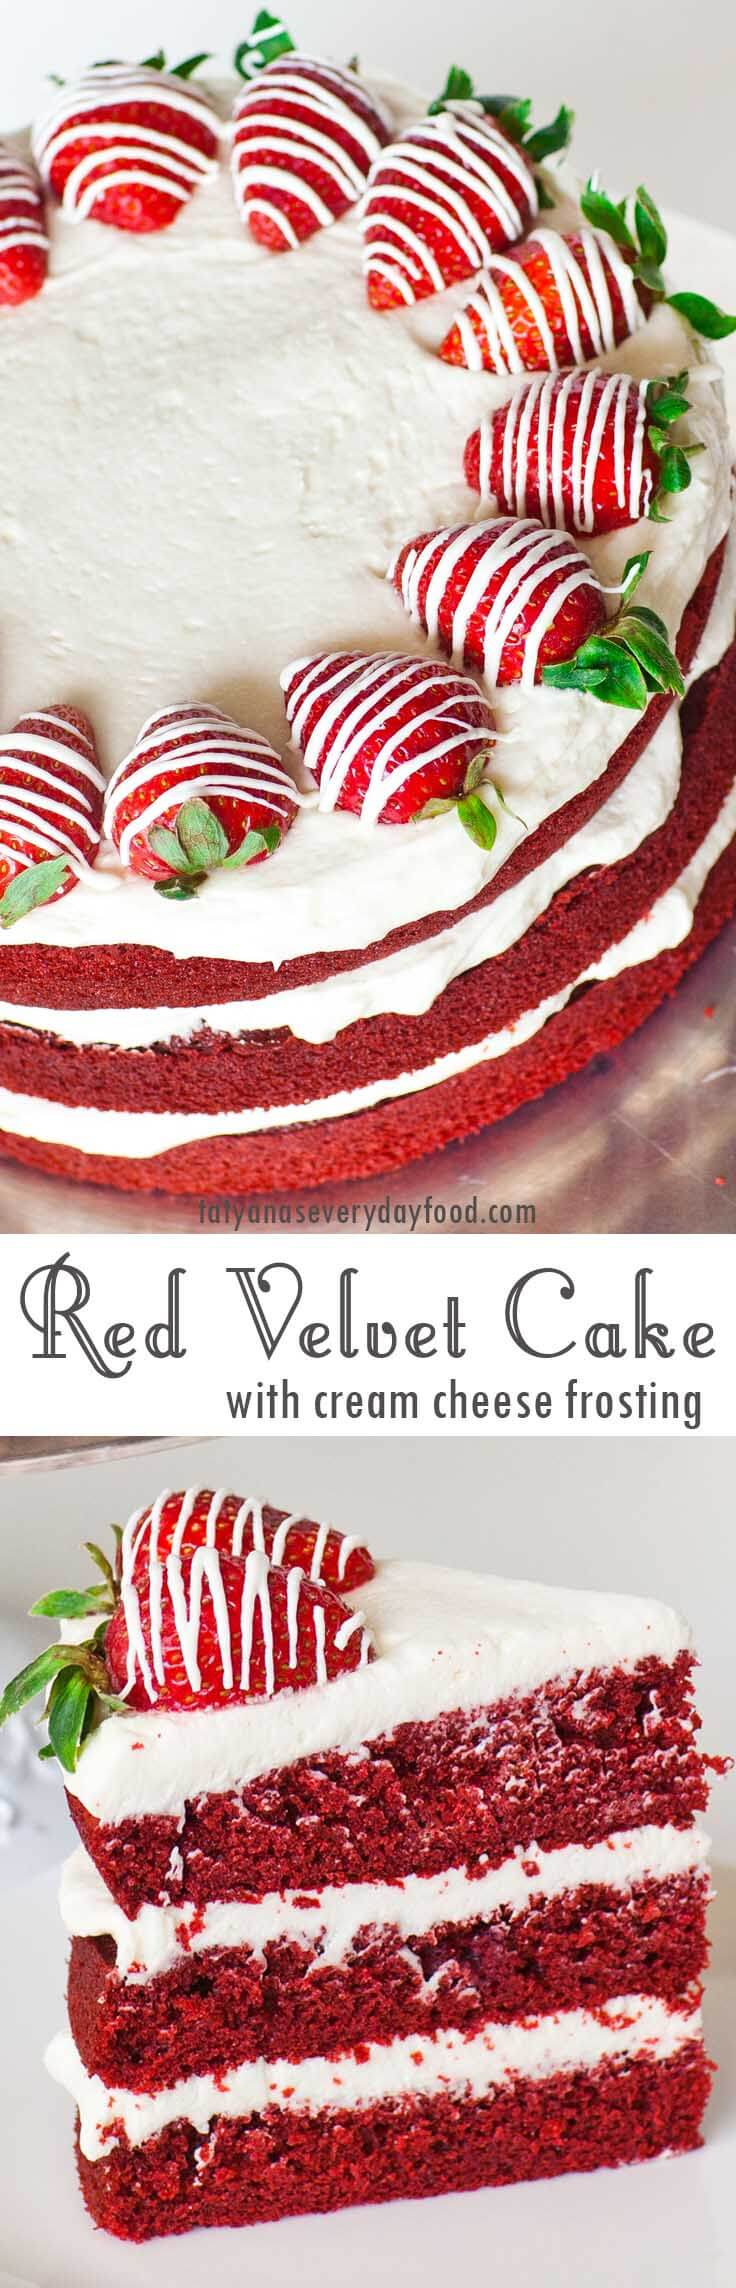 Classic Red Velvet Cake video recipe